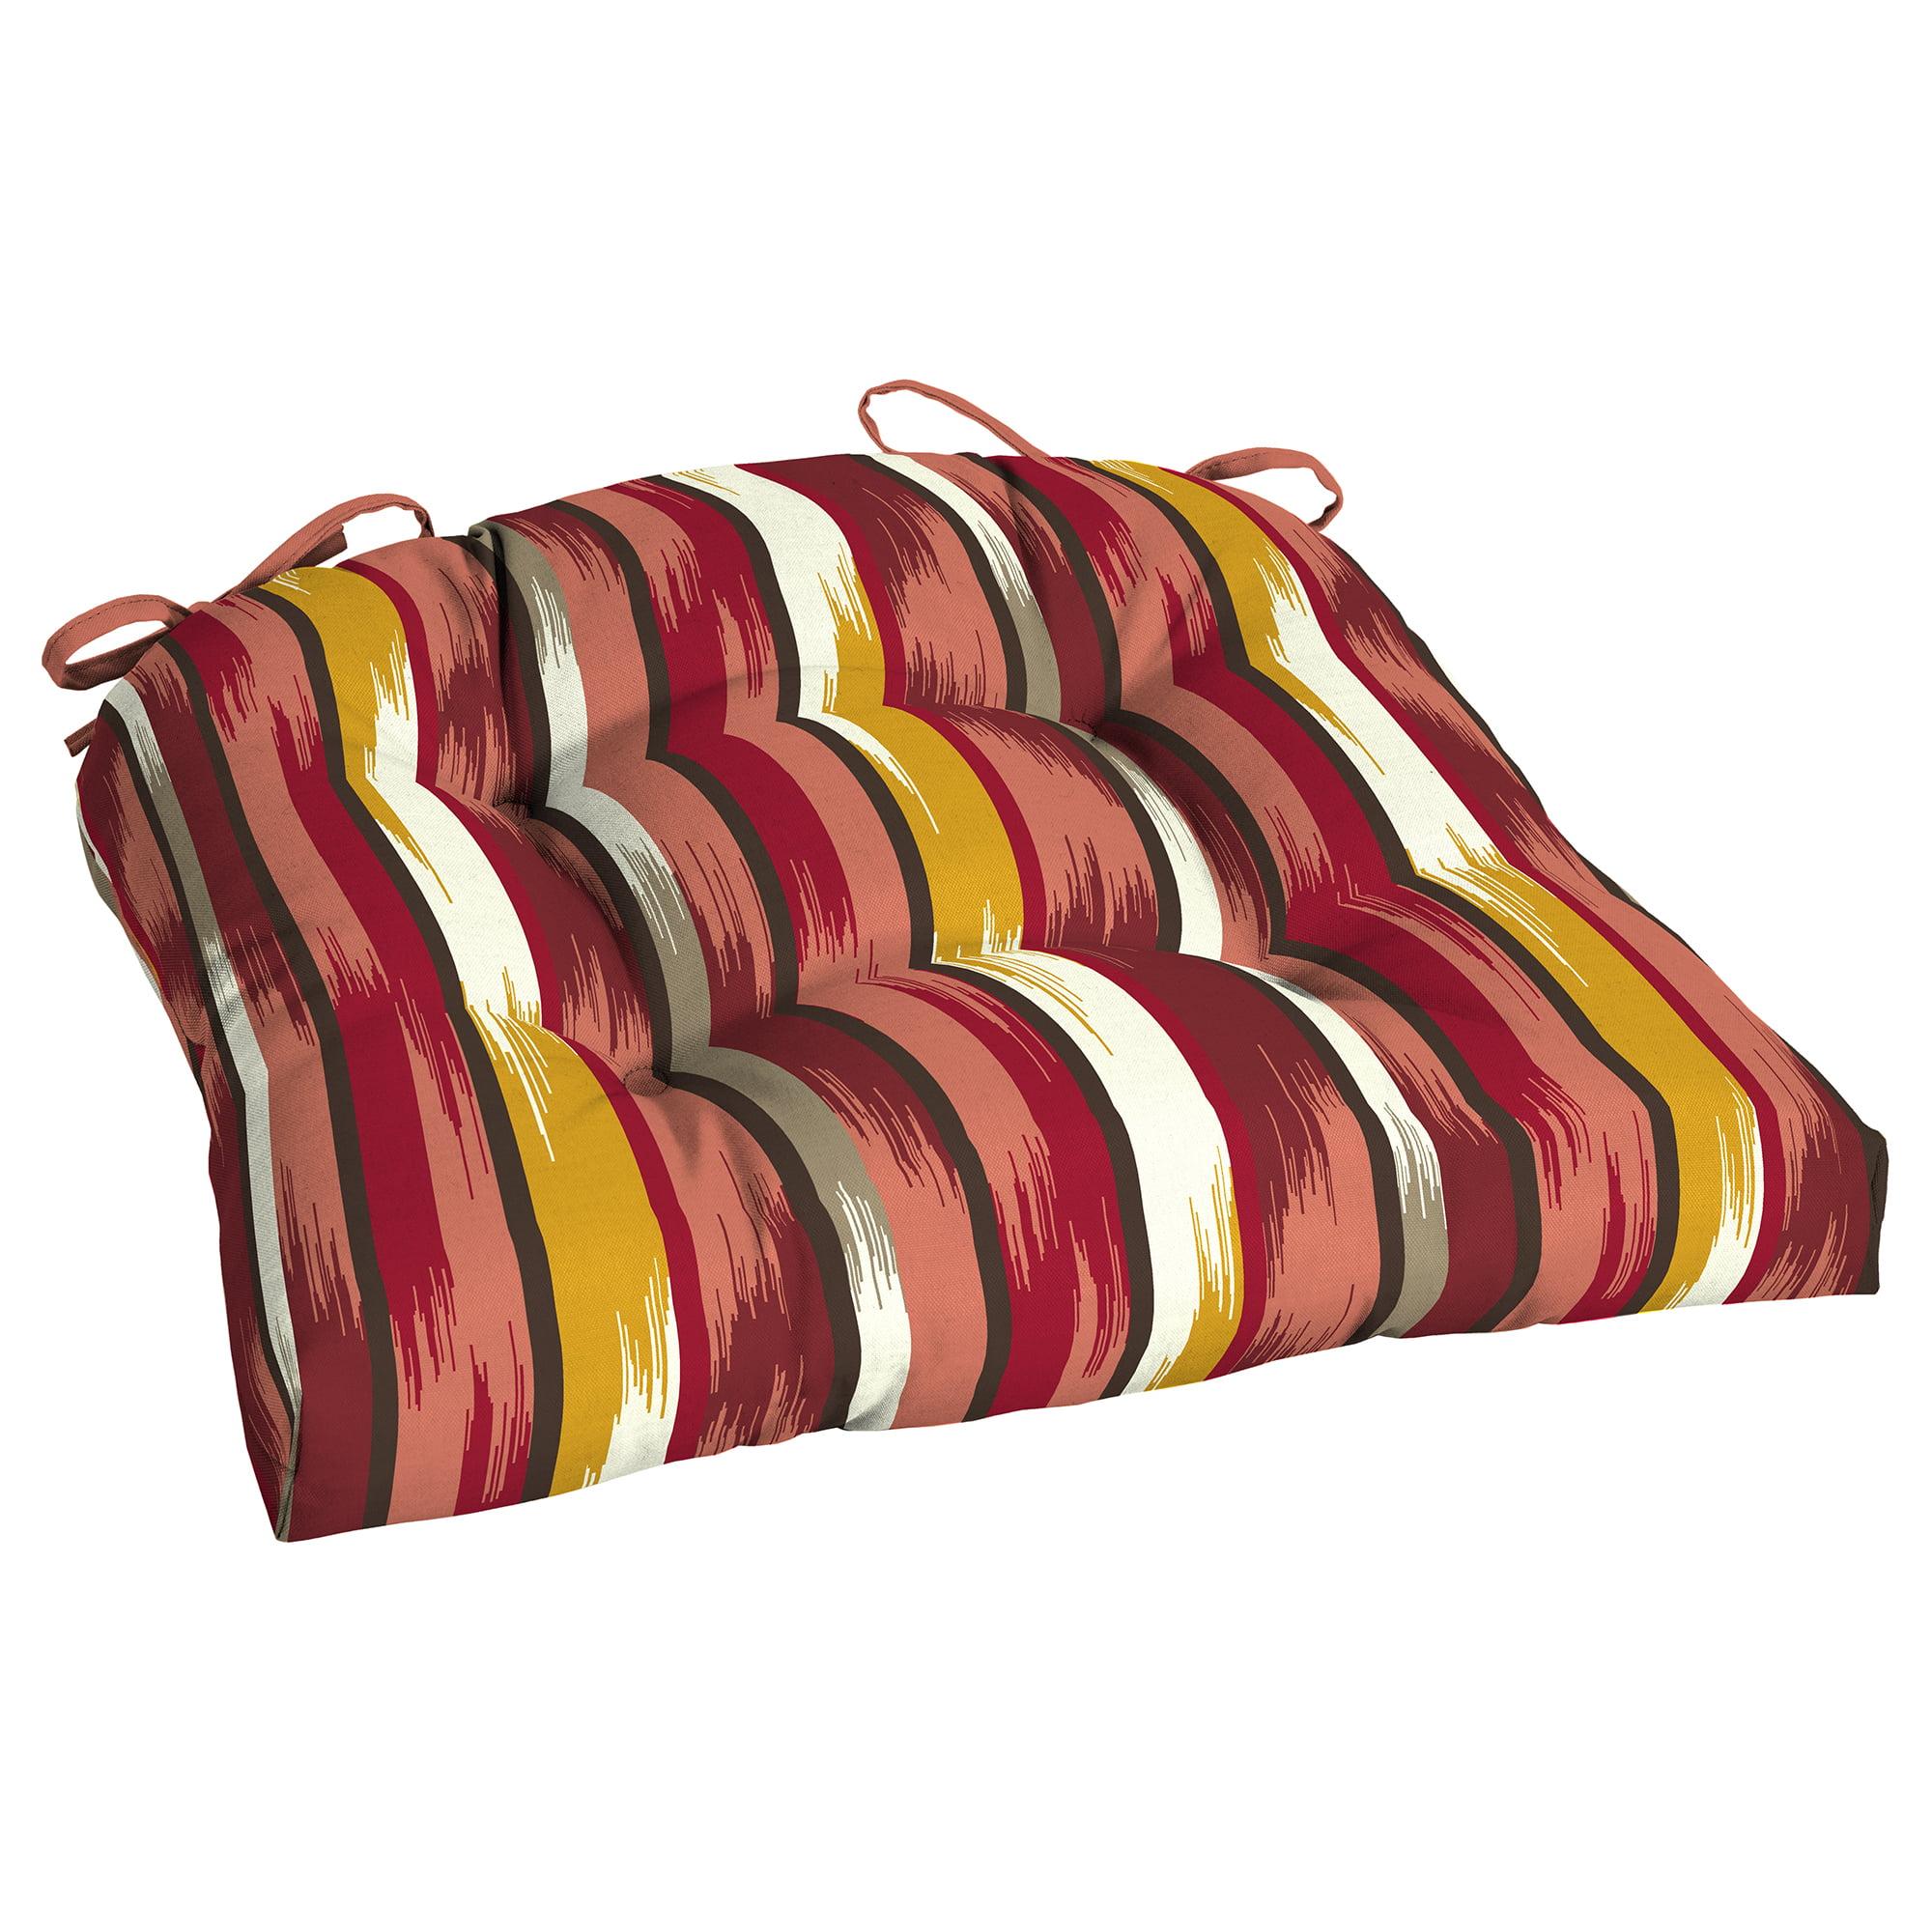 Mainstays Ombre Stripe Outdoor Patio Wicker Seat Cushion - Single